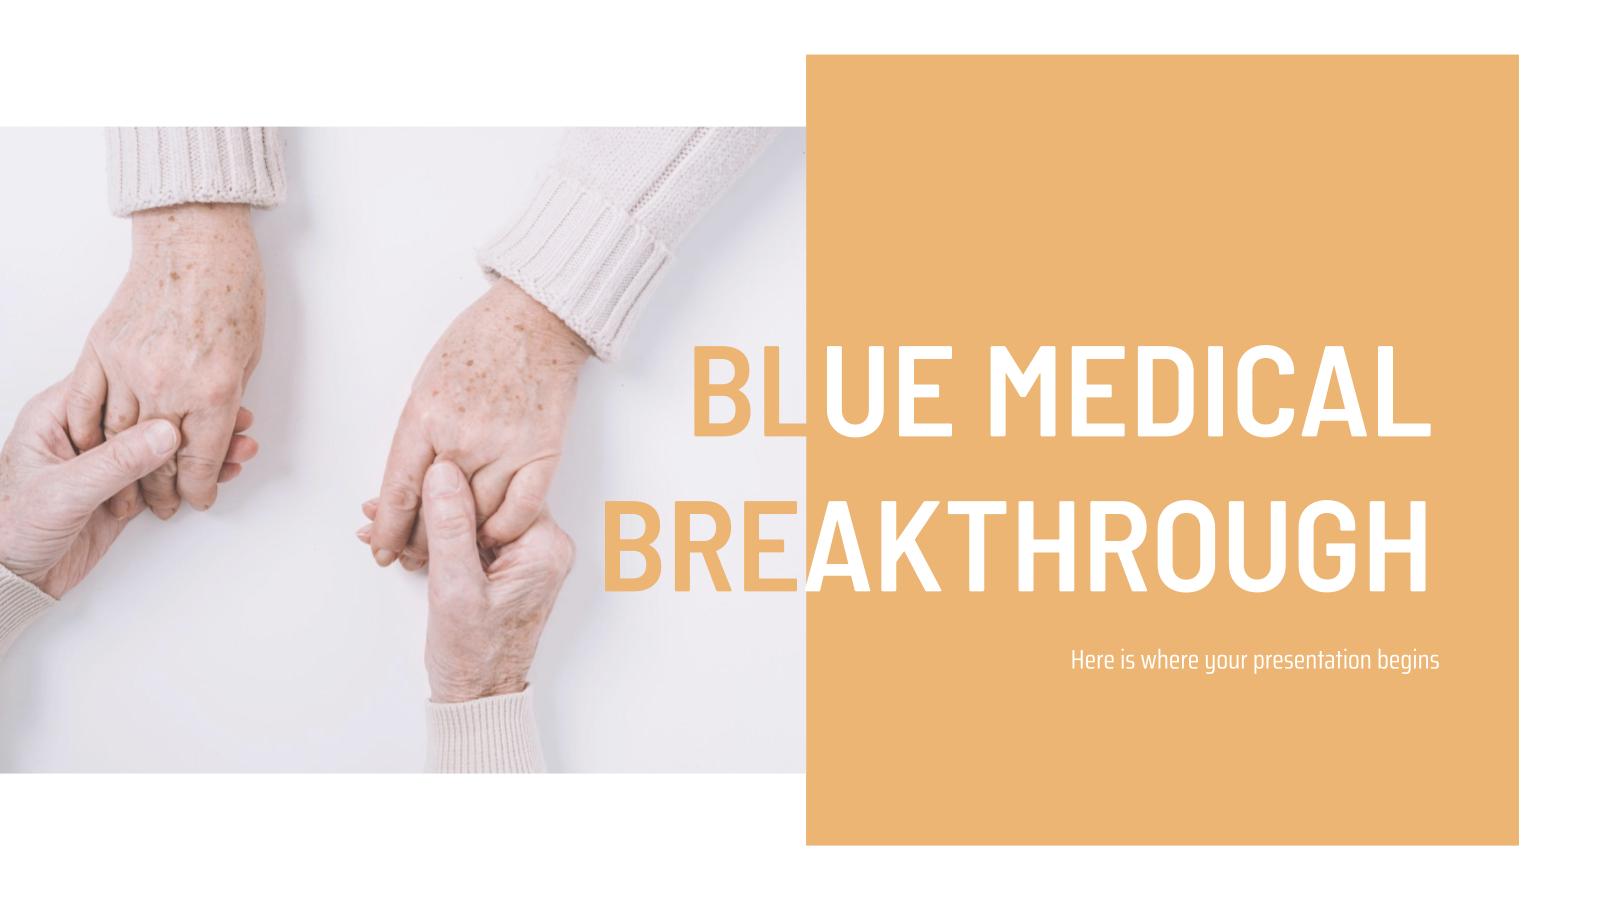 Blue Medical Breakthrough presentation template